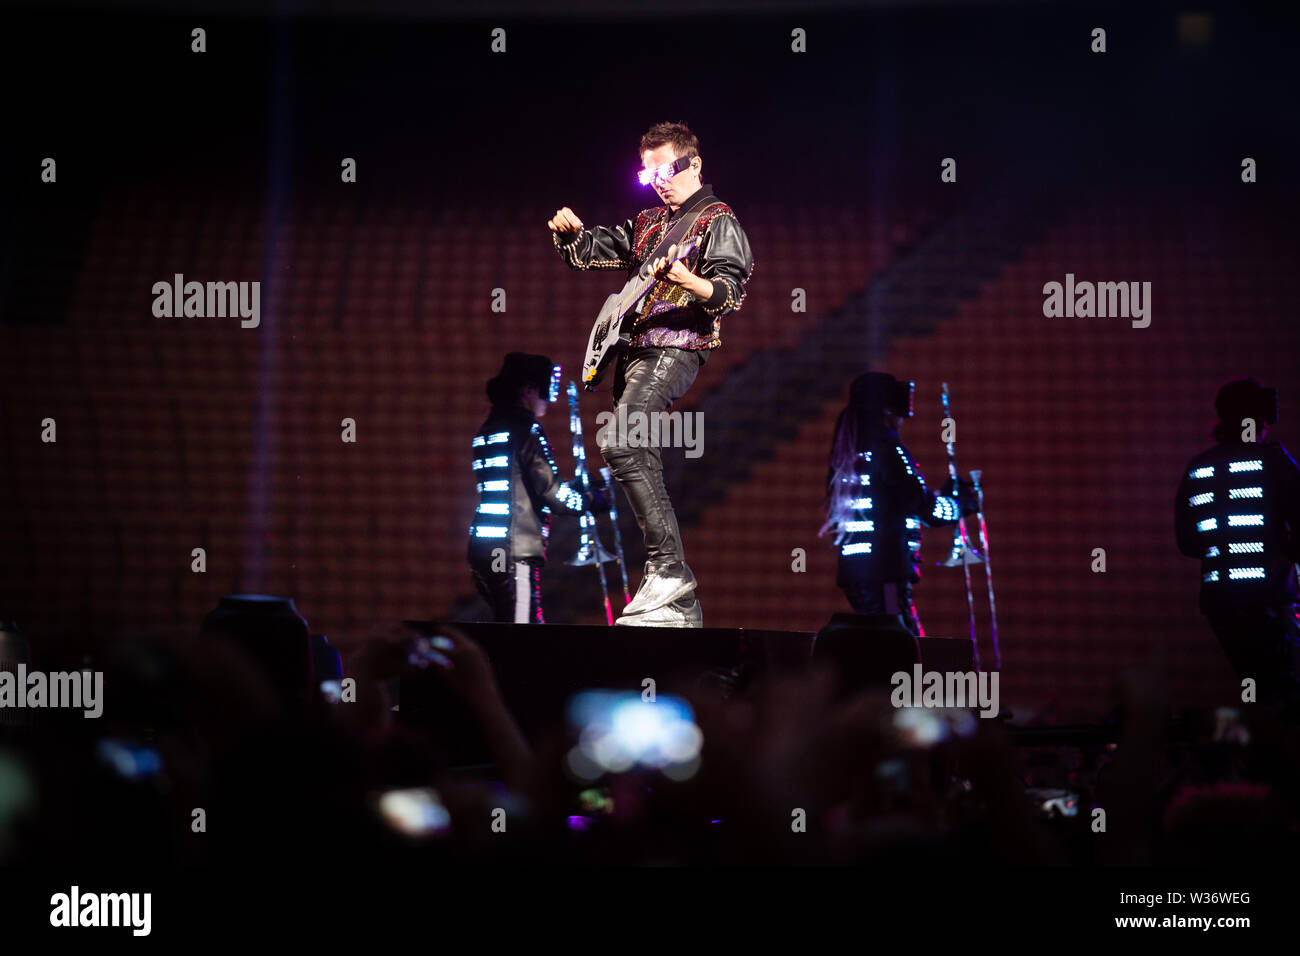 Milan, 12th of July. MUSE performs live @ Stadio Giuseppe Meazza di San Siro, Milano. Copyright Davide Merli | Alamy Stock Photo